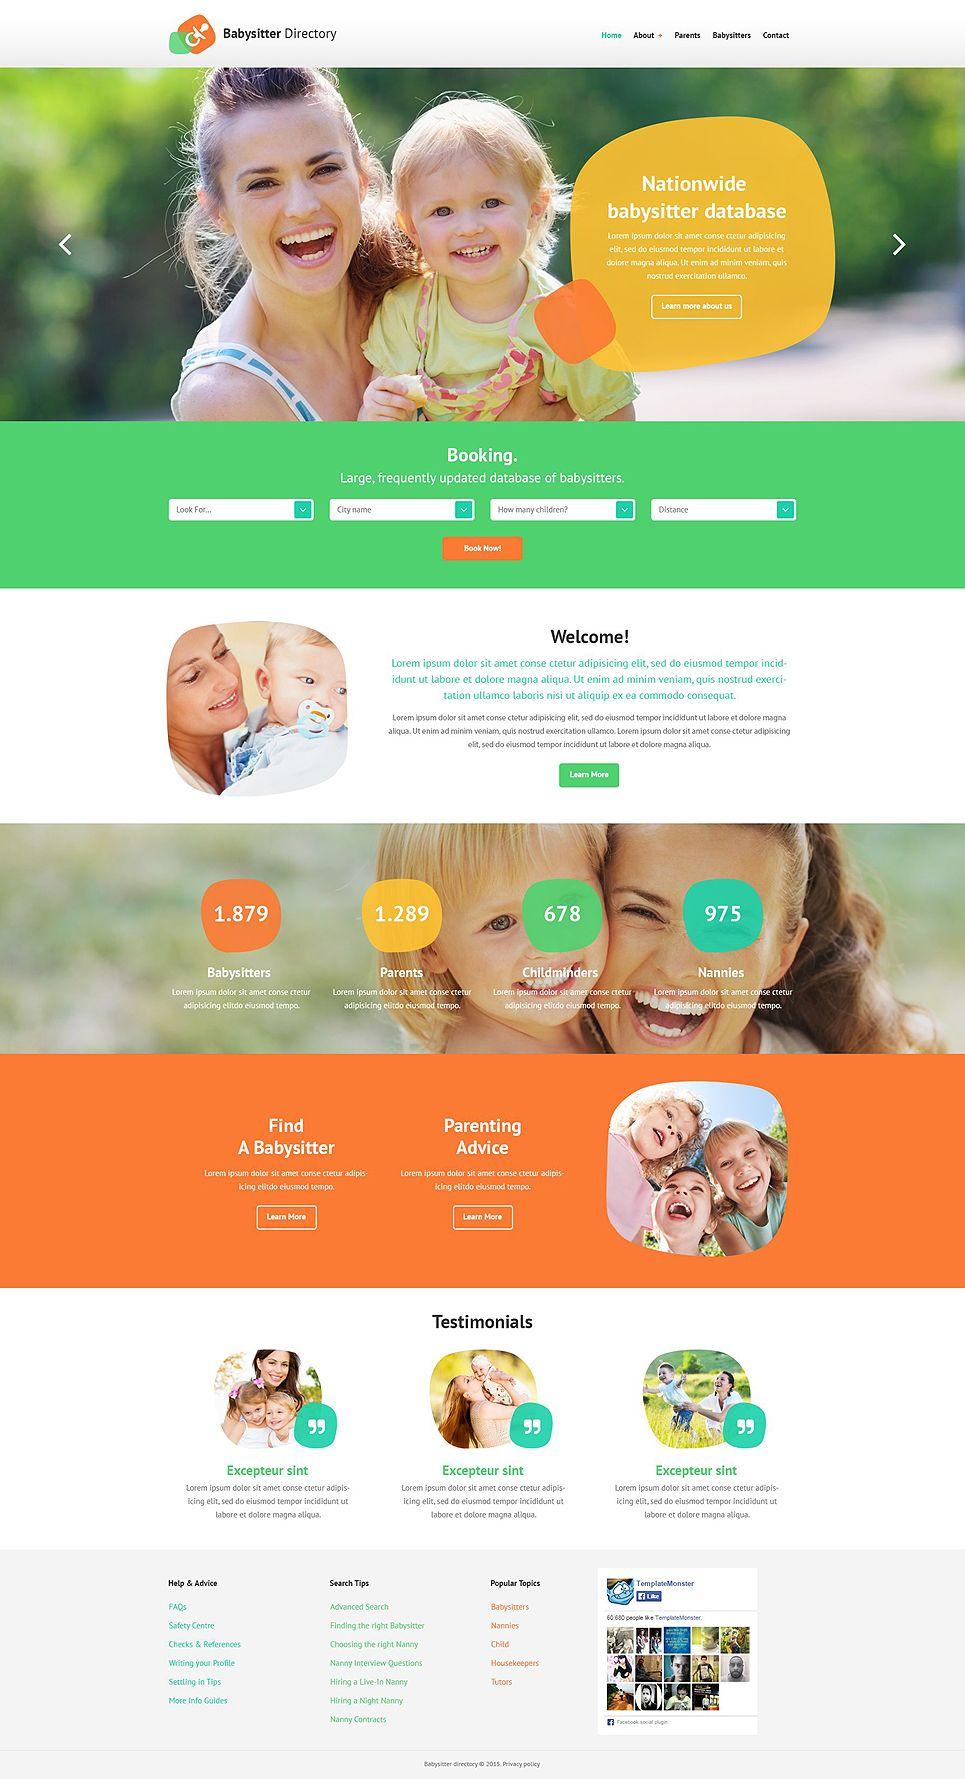 Babysitter Directory Website Template, #Ad #Directory #Babysitter #Template #Website - Website template, Website template design, Education wordpress themes - 웹